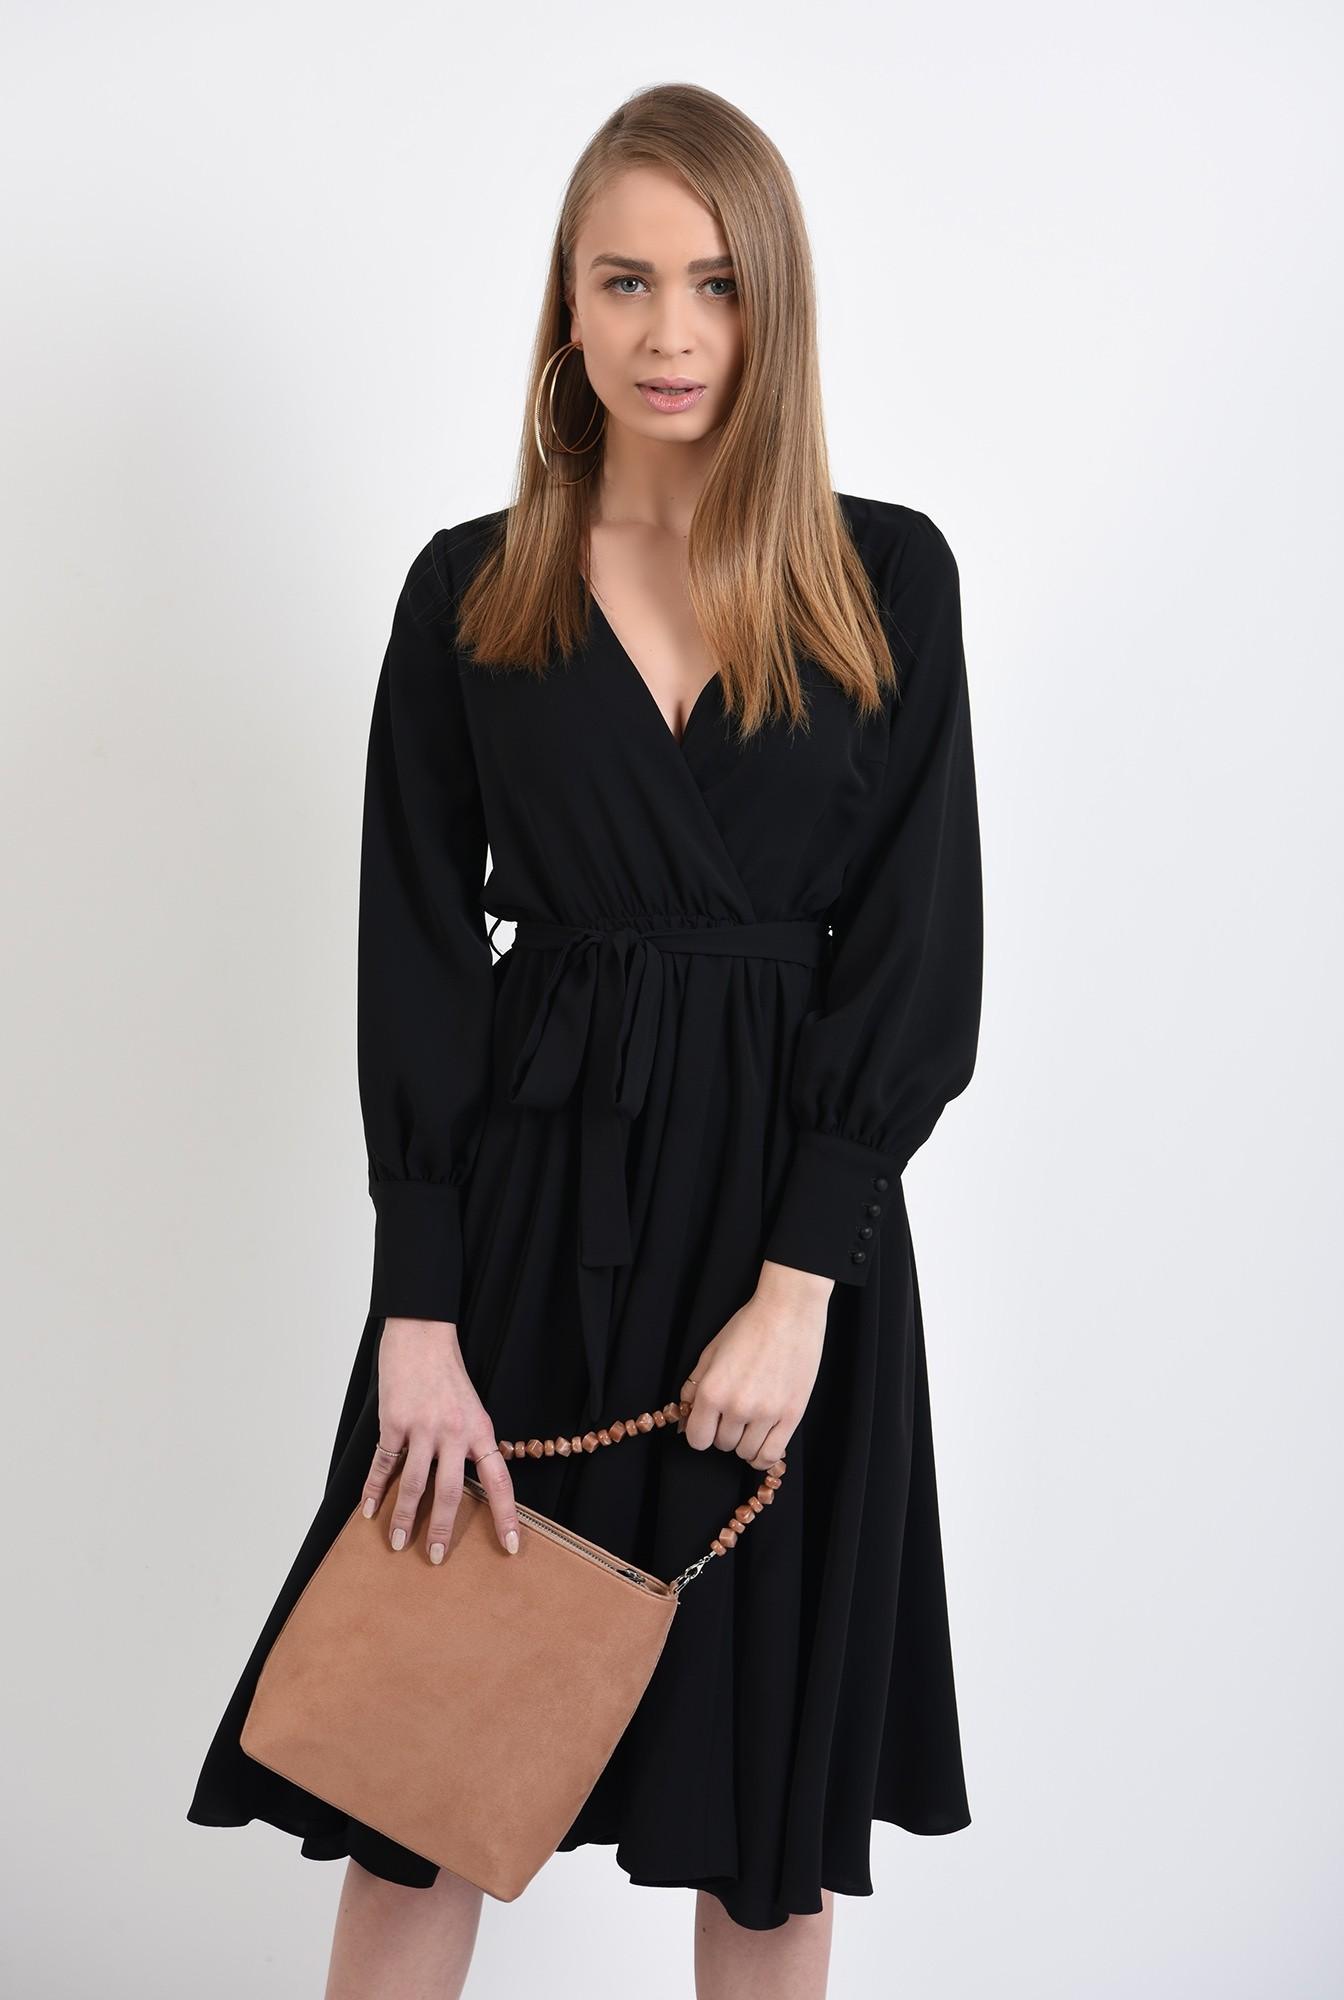 2 - rochie neagra, cu anchior petrecut, midi, evazata, cu cordon, rochie de primavara